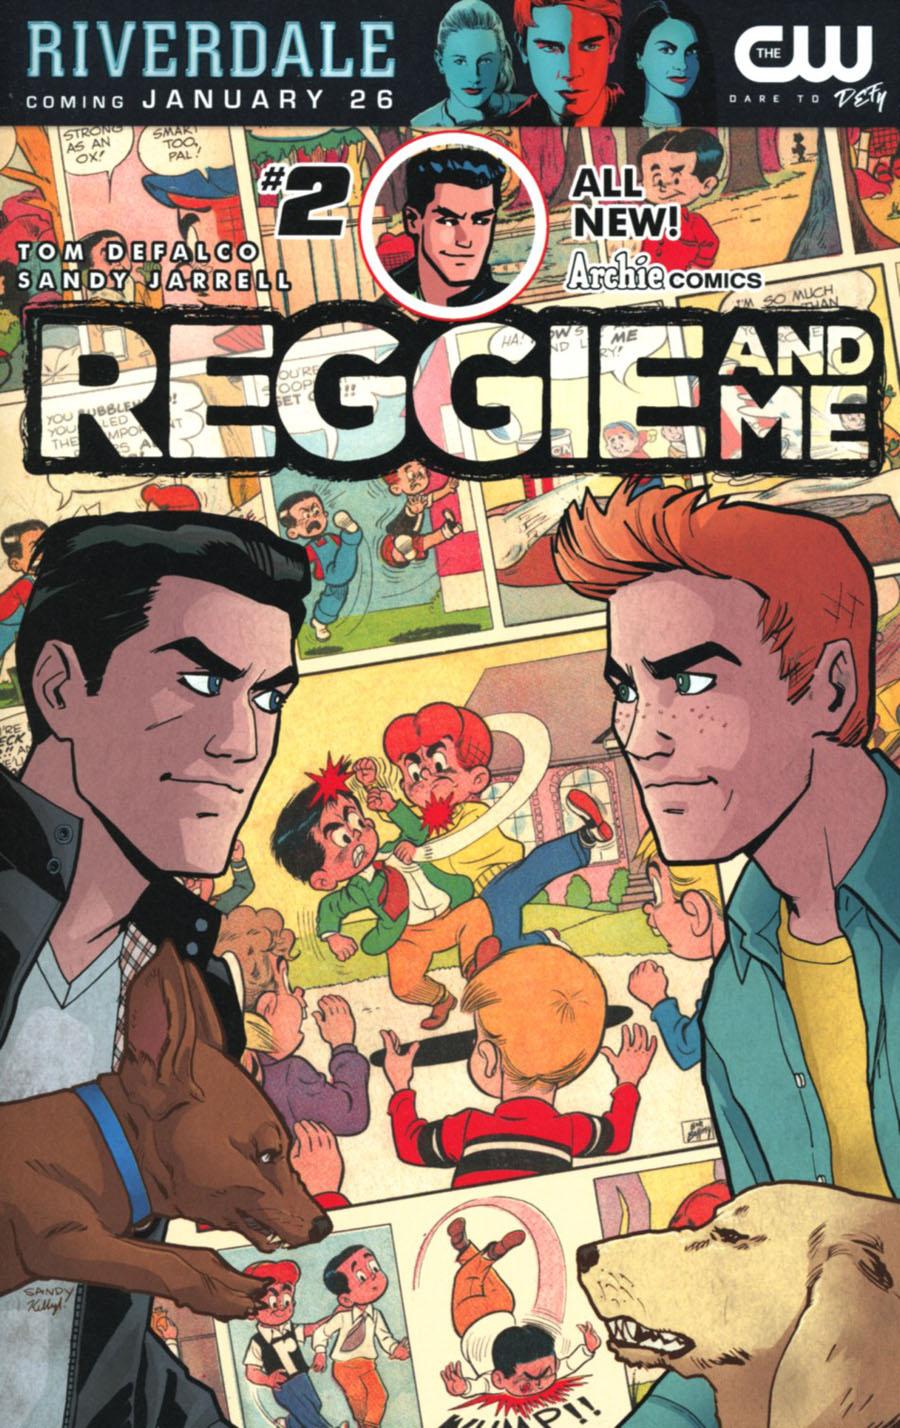 Reggie And Me Vol 2 #2 Cover A Regular Sandy Jarrell Cover